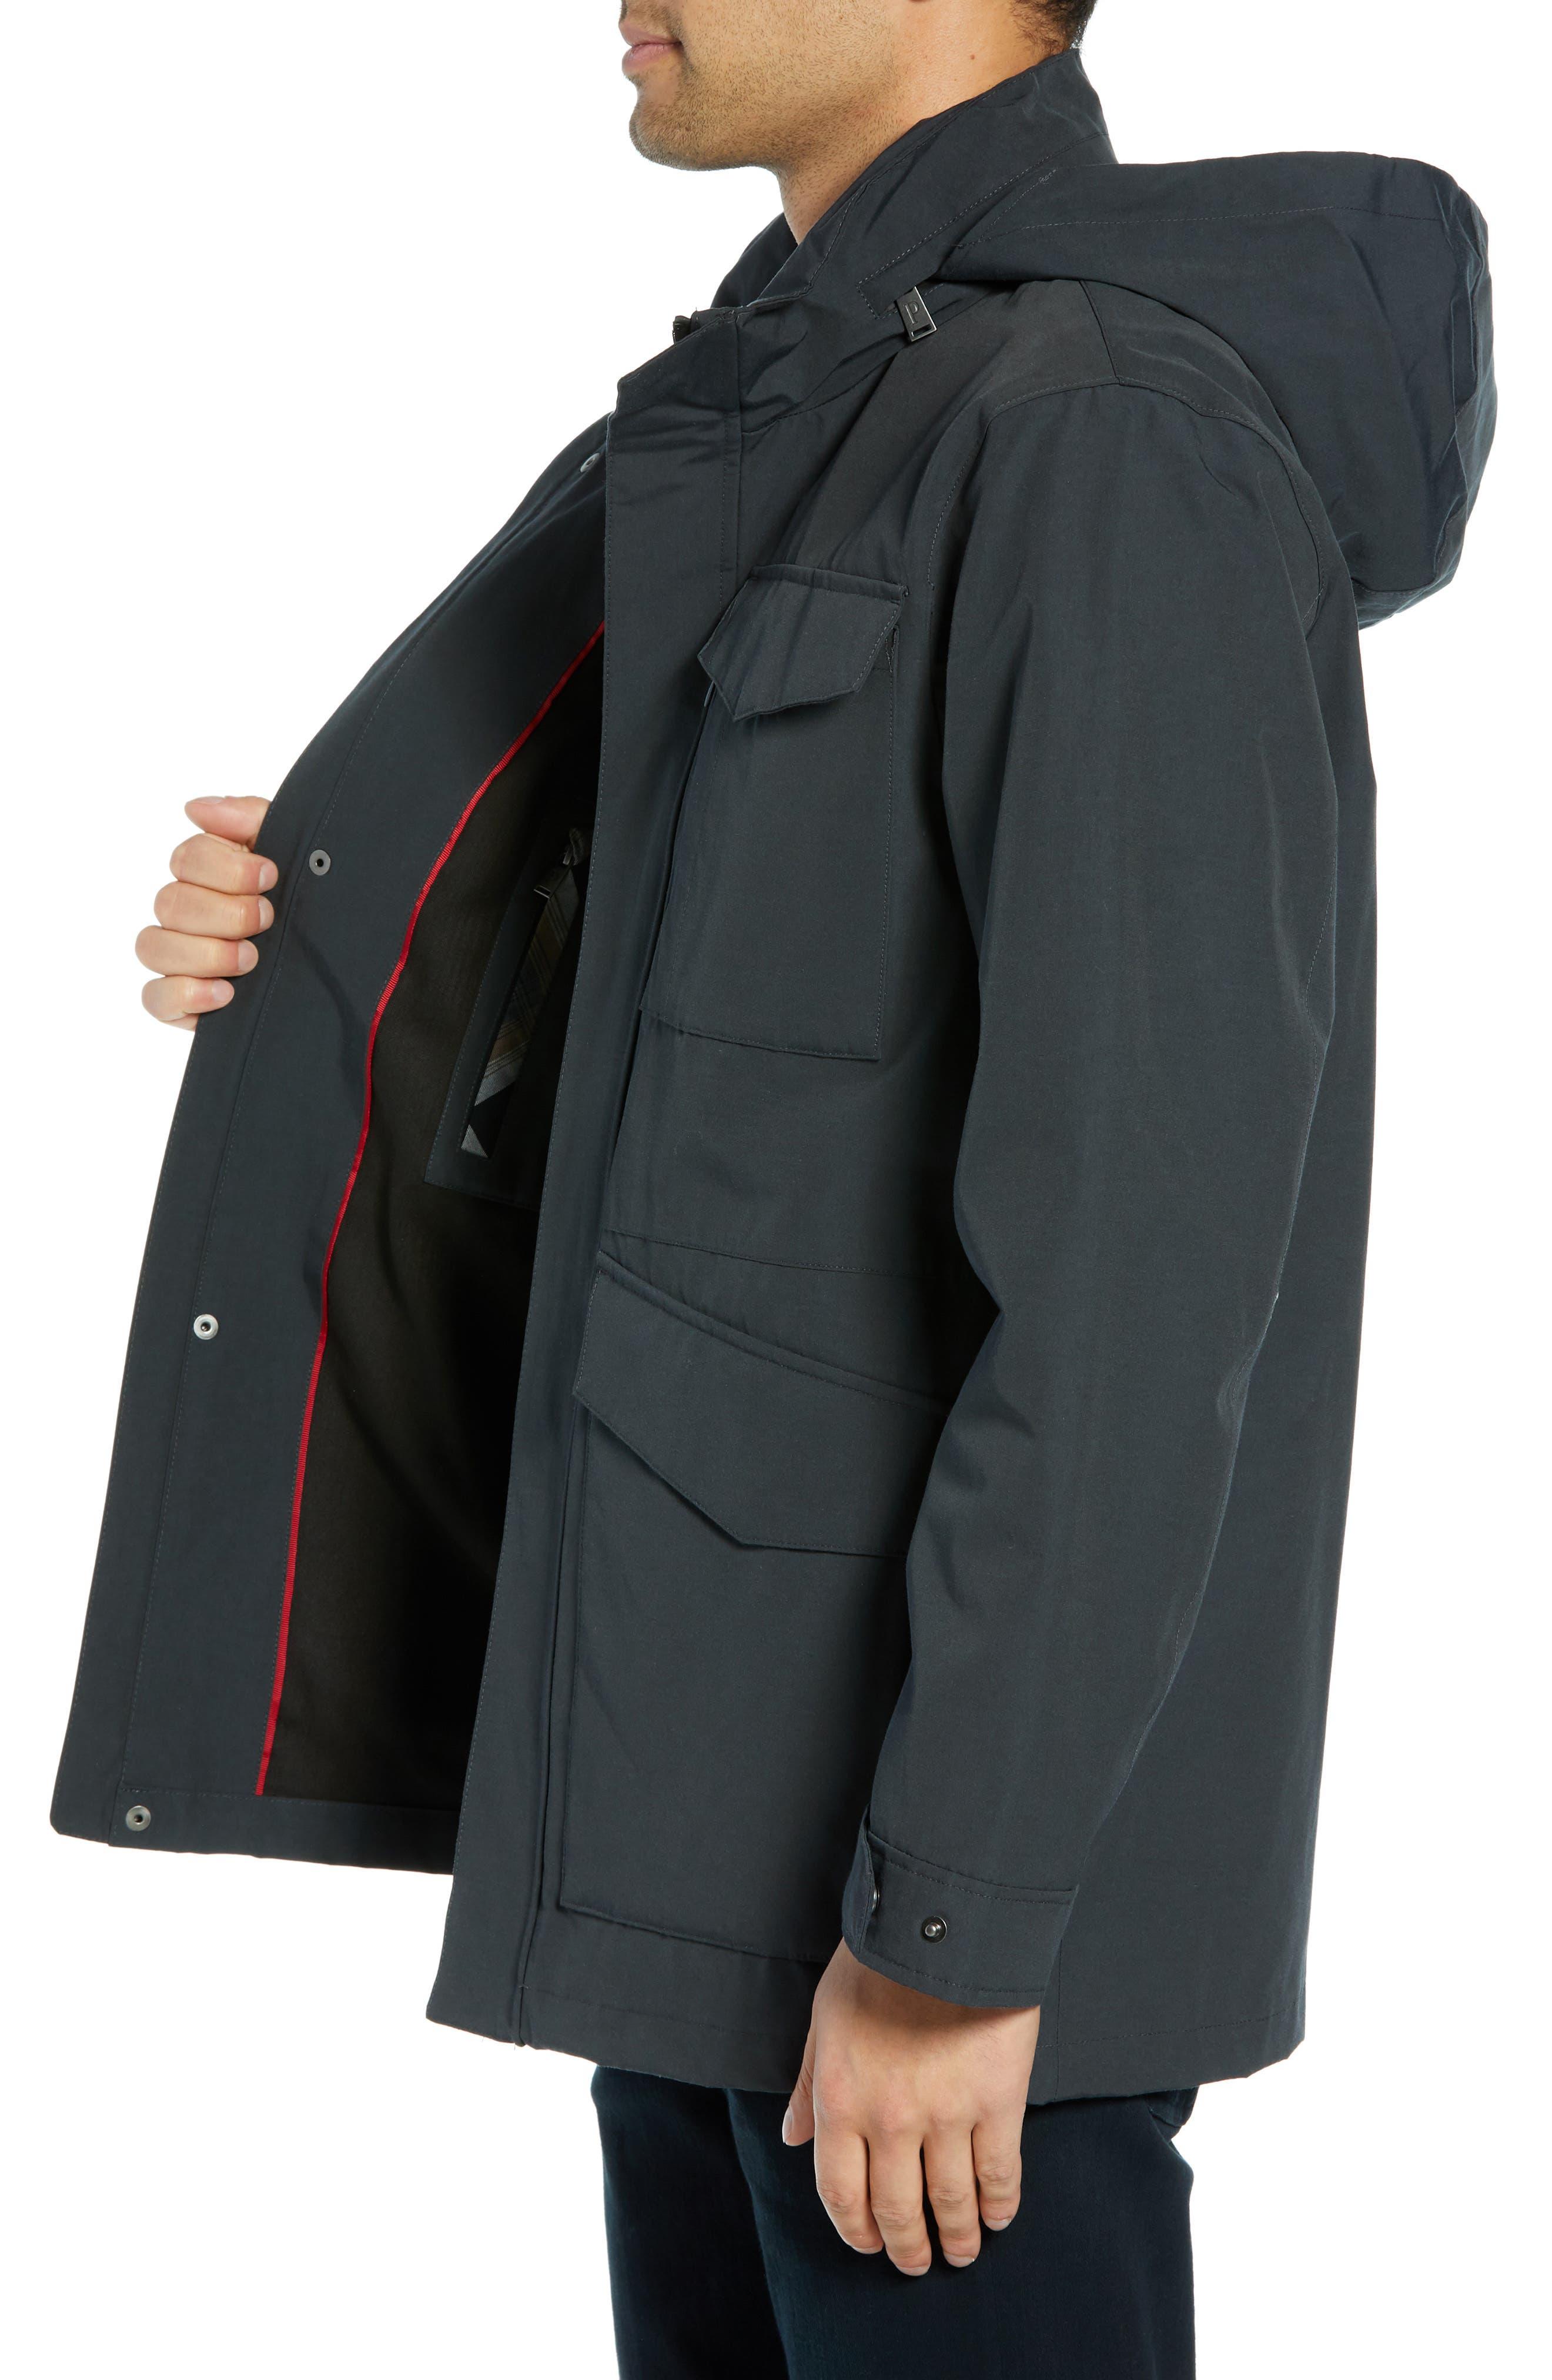 Clyde Hill Commuter Coat,                             Alternate thumbnail 3, color,                             SLATE